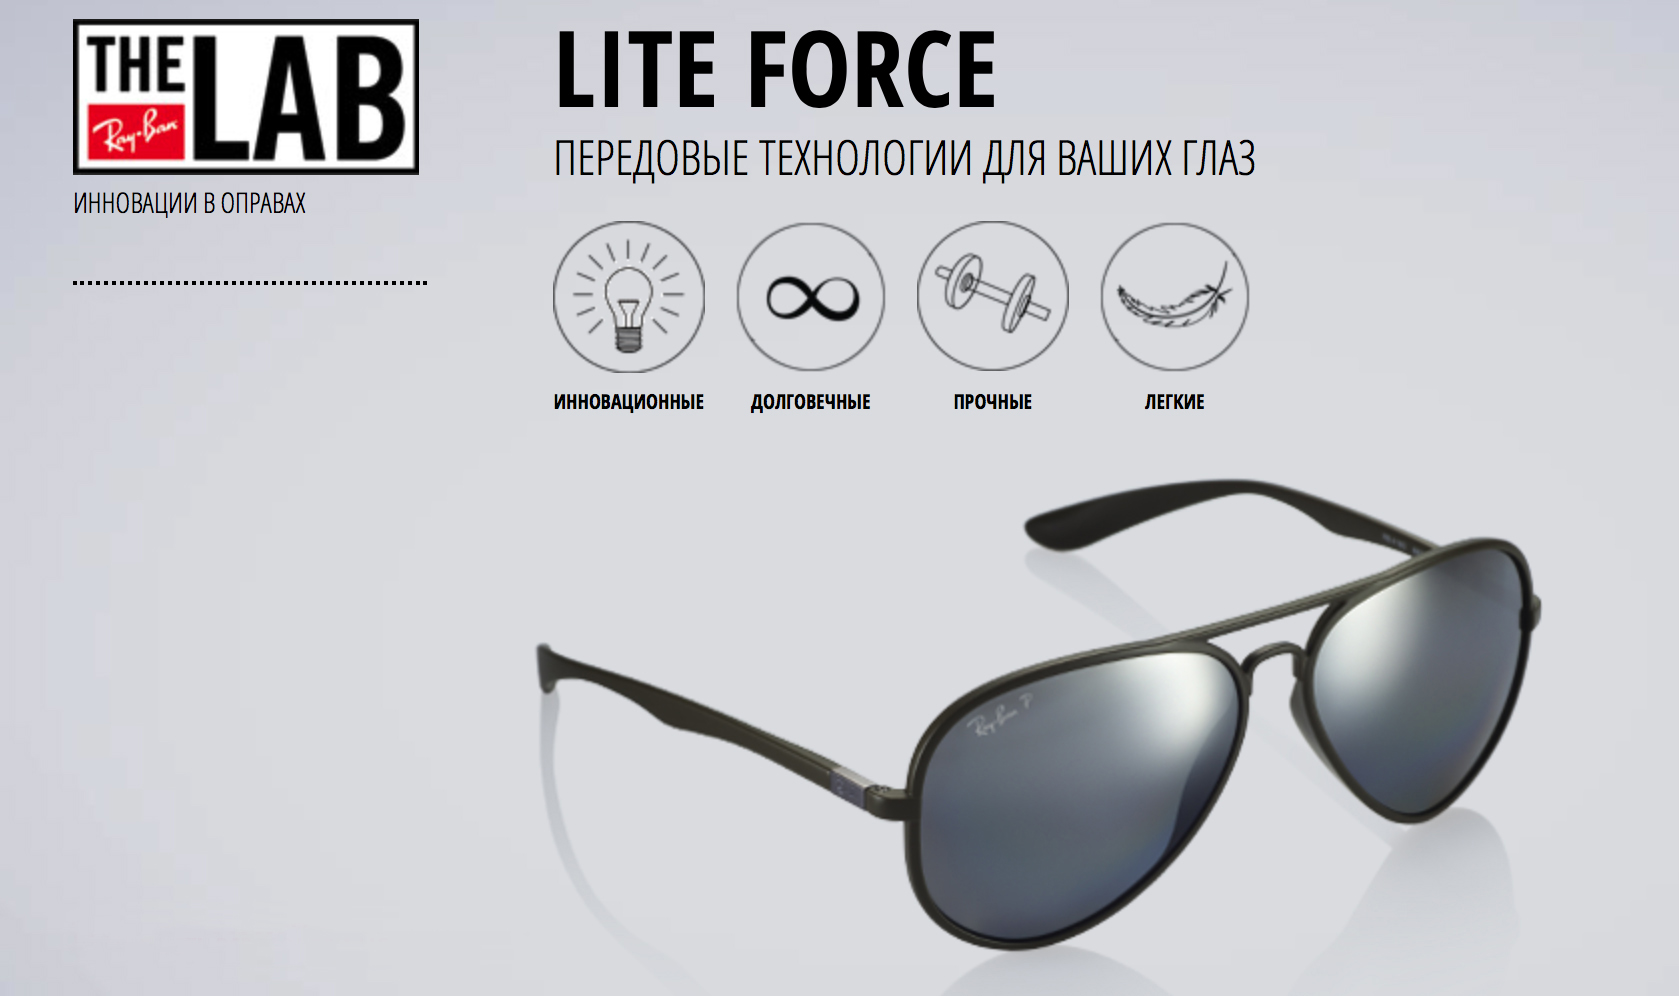 Lite Force